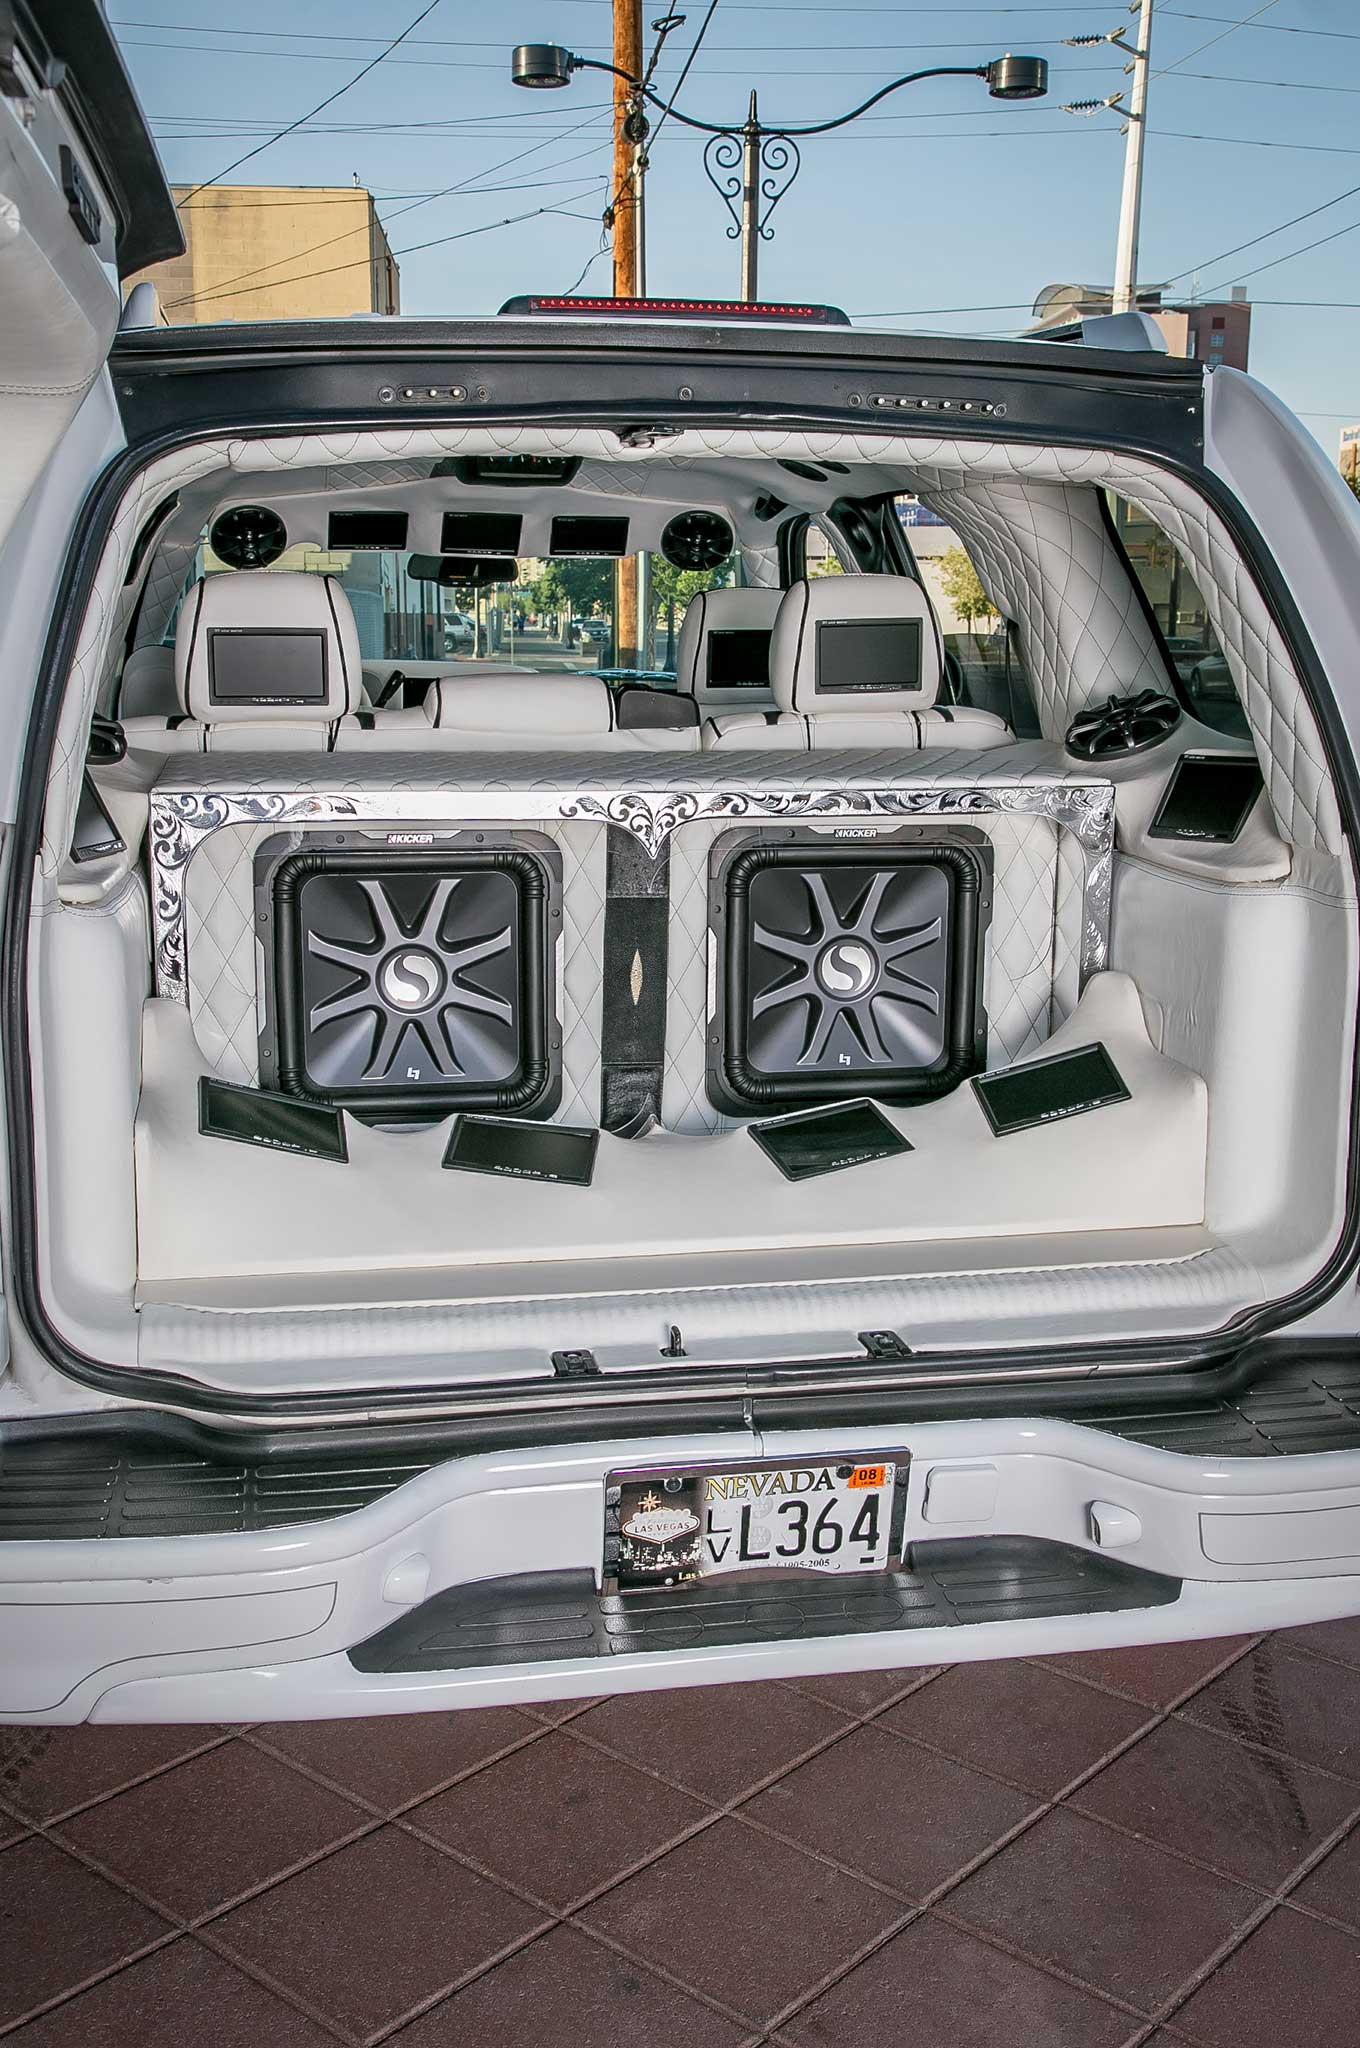 2015 Dodge Magnum >> 2005 Chevrolet Tahoe - Pale Rider - Lowrider